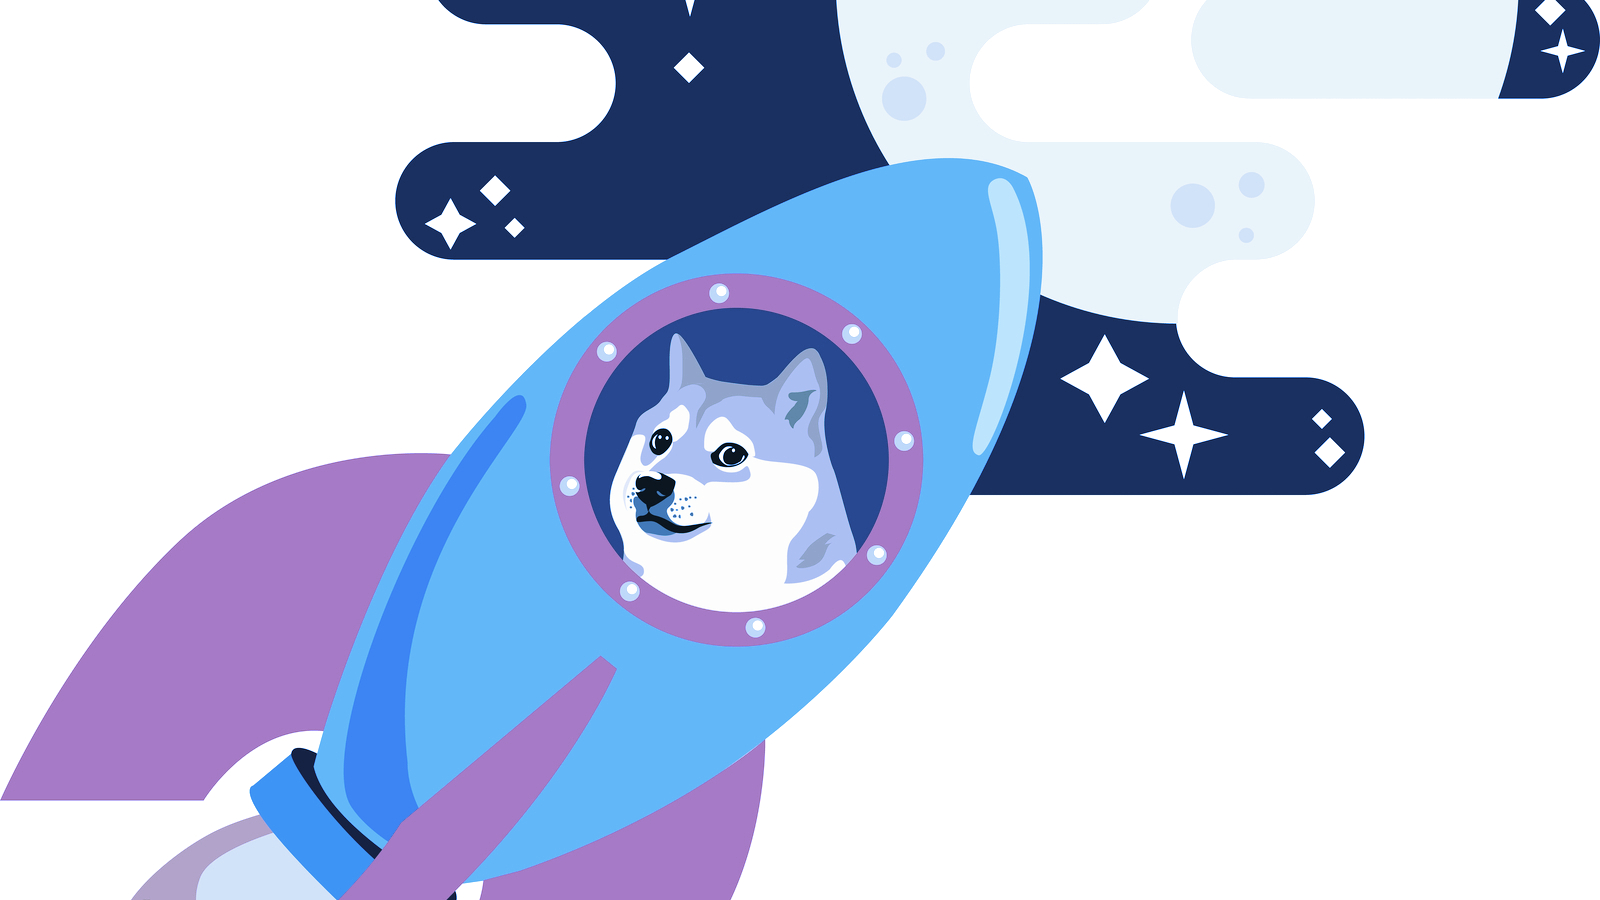 Dogecoin Rises 10% After Elon Musk Confirms Coin Will Get SNL Treatment